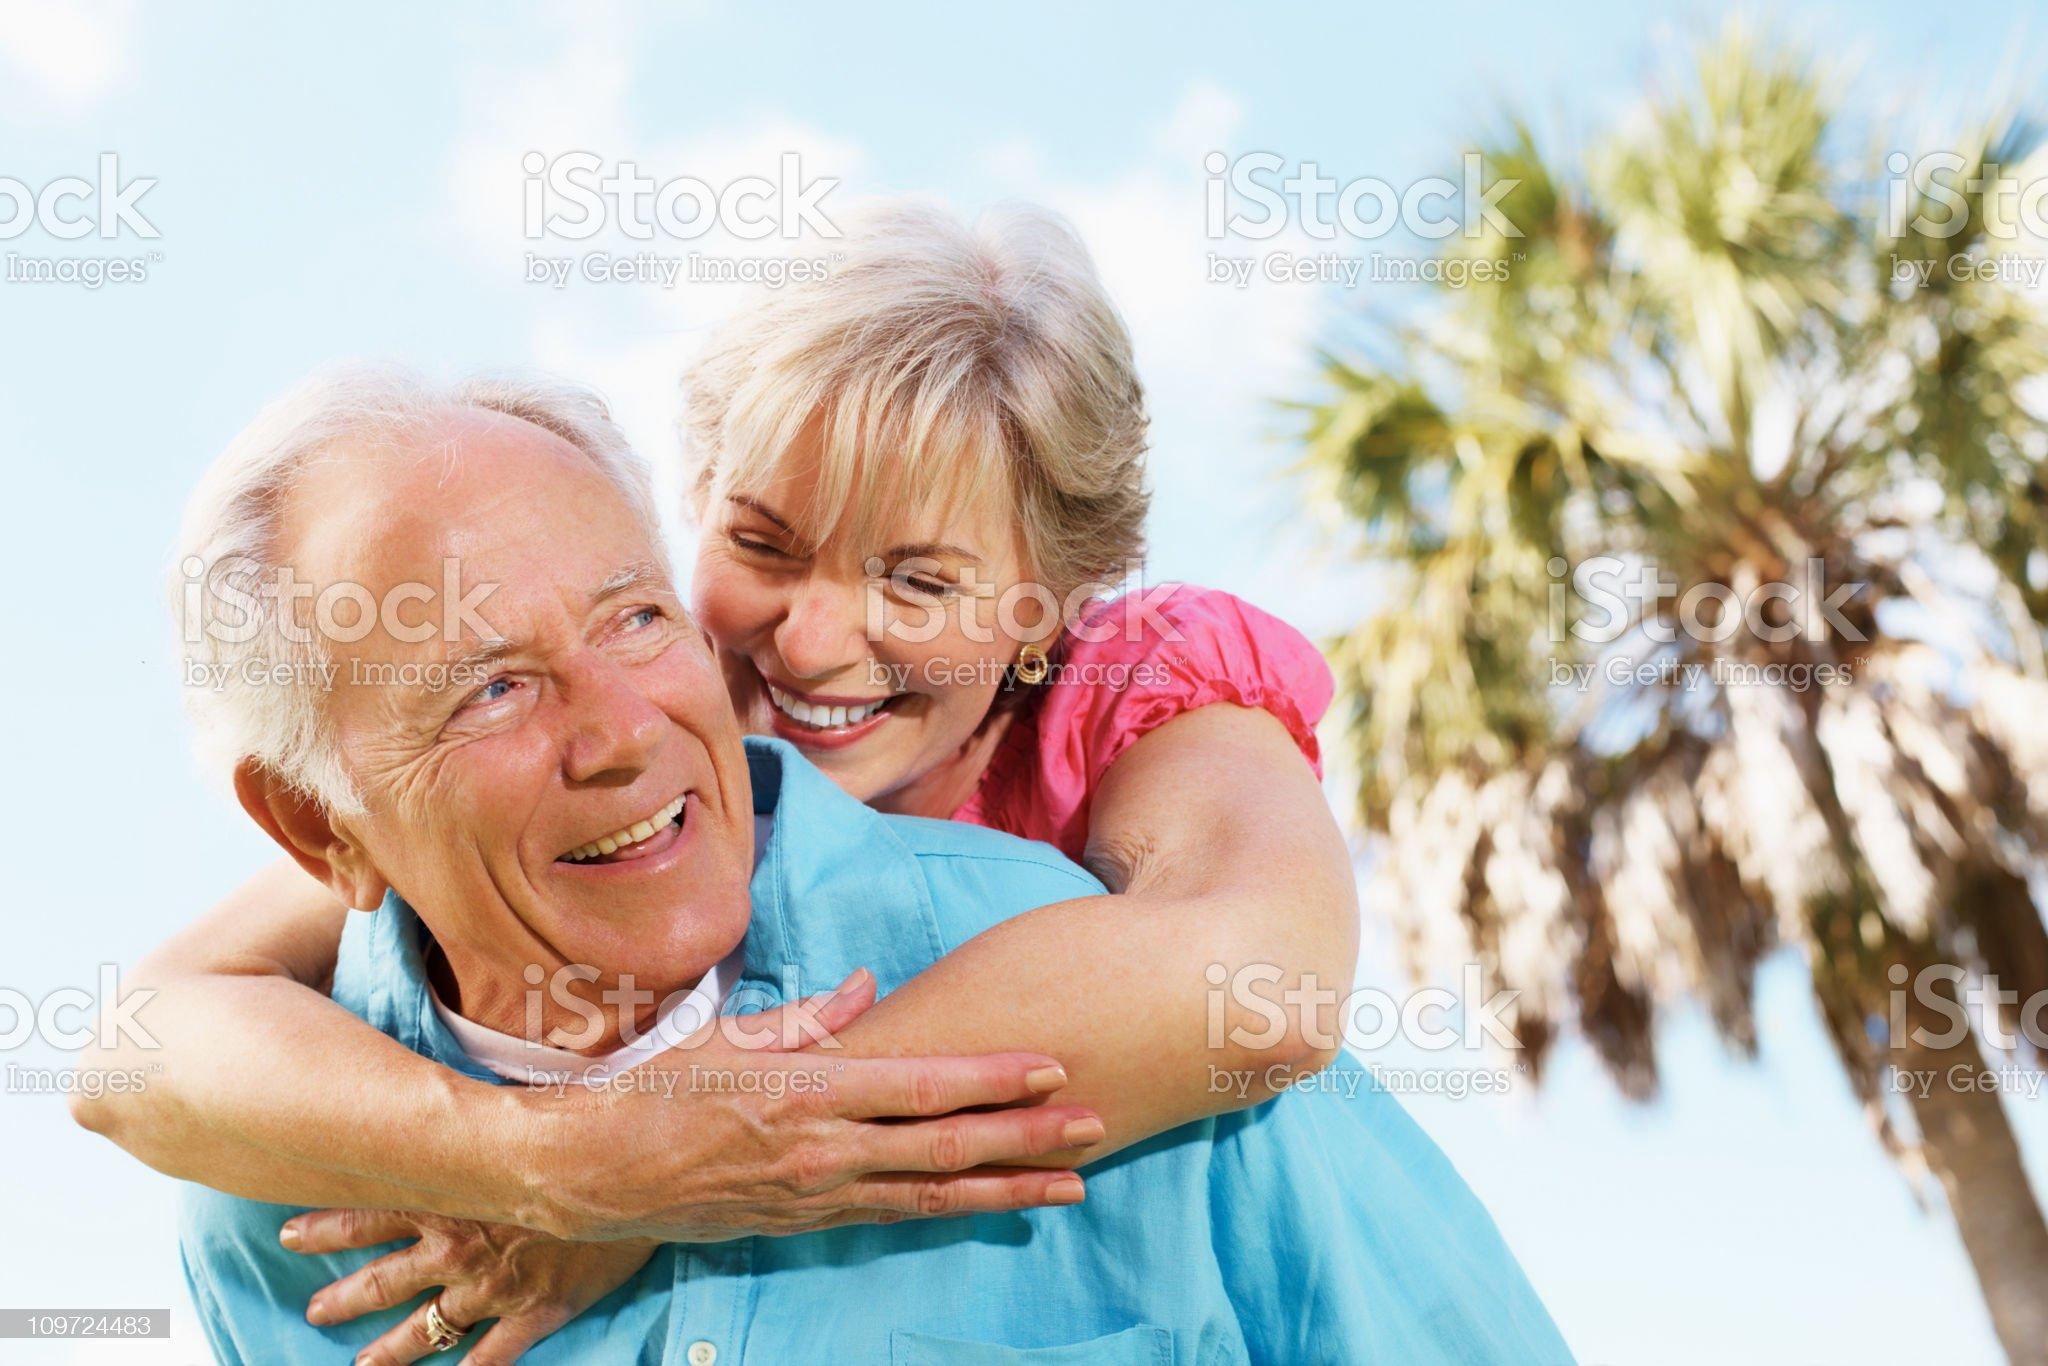 Piggybacking - Smiling mature couple enjoying themselves royalty-free stock photo